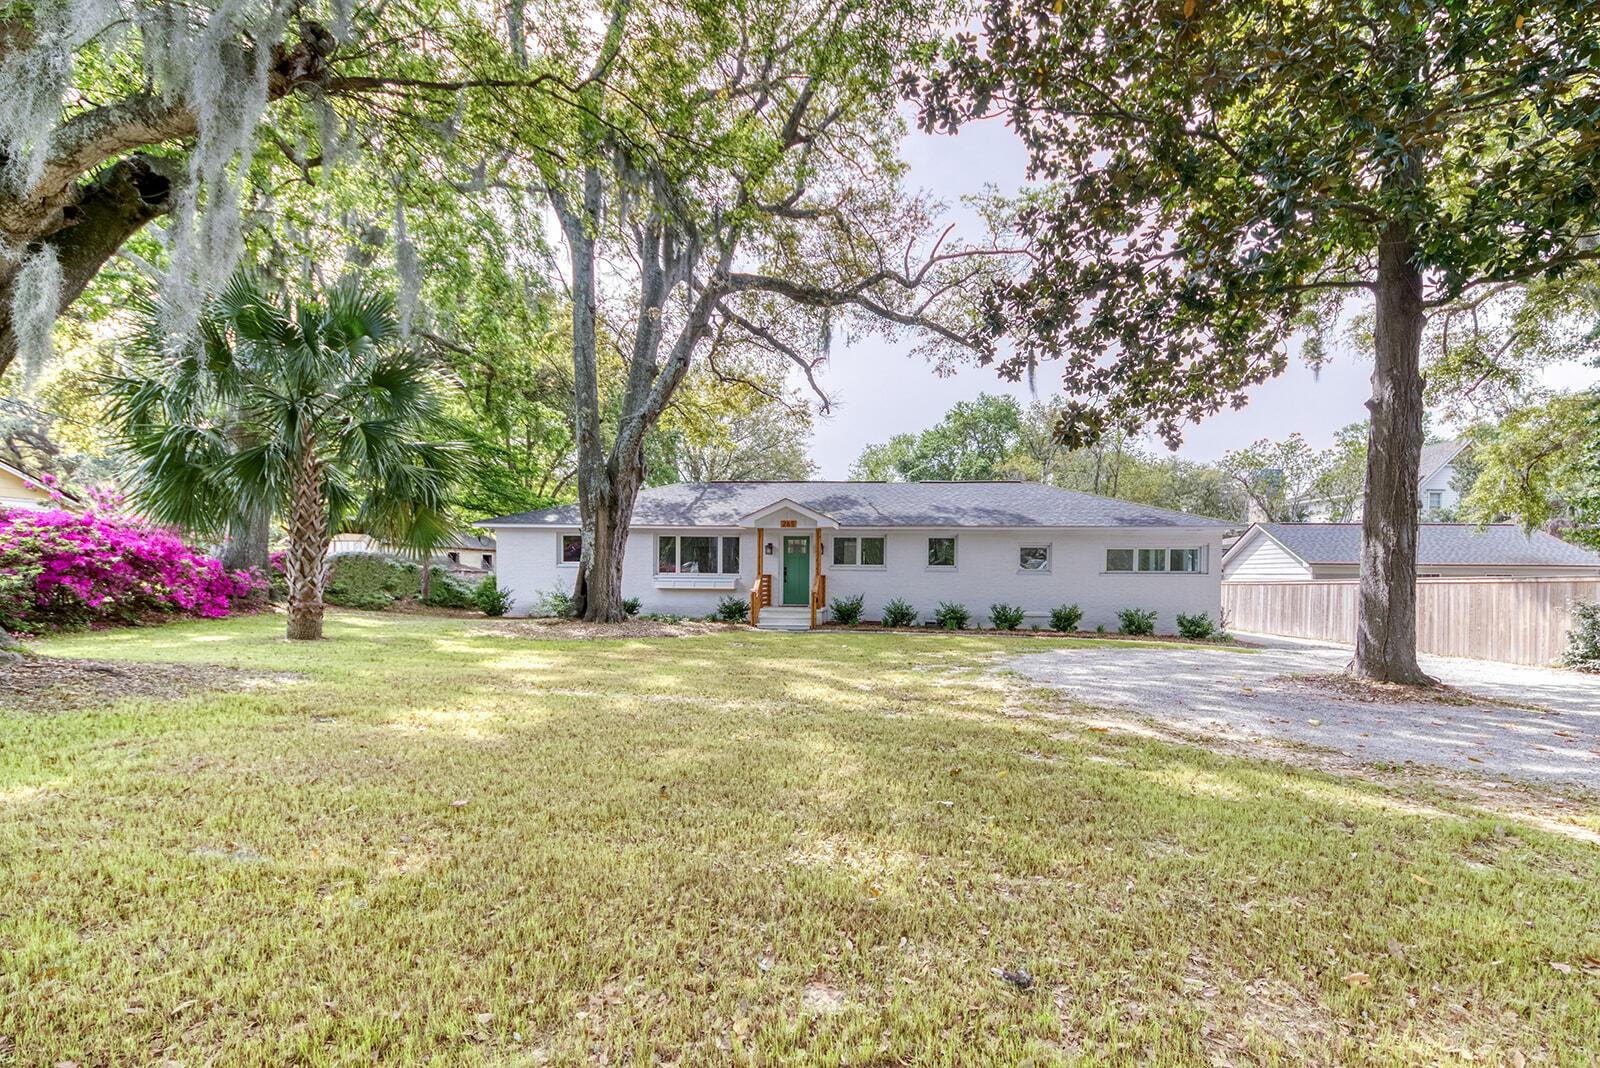 Bay View Acres Homes For Sale - 265 Coleman, Mount Pleasant, SC - 49